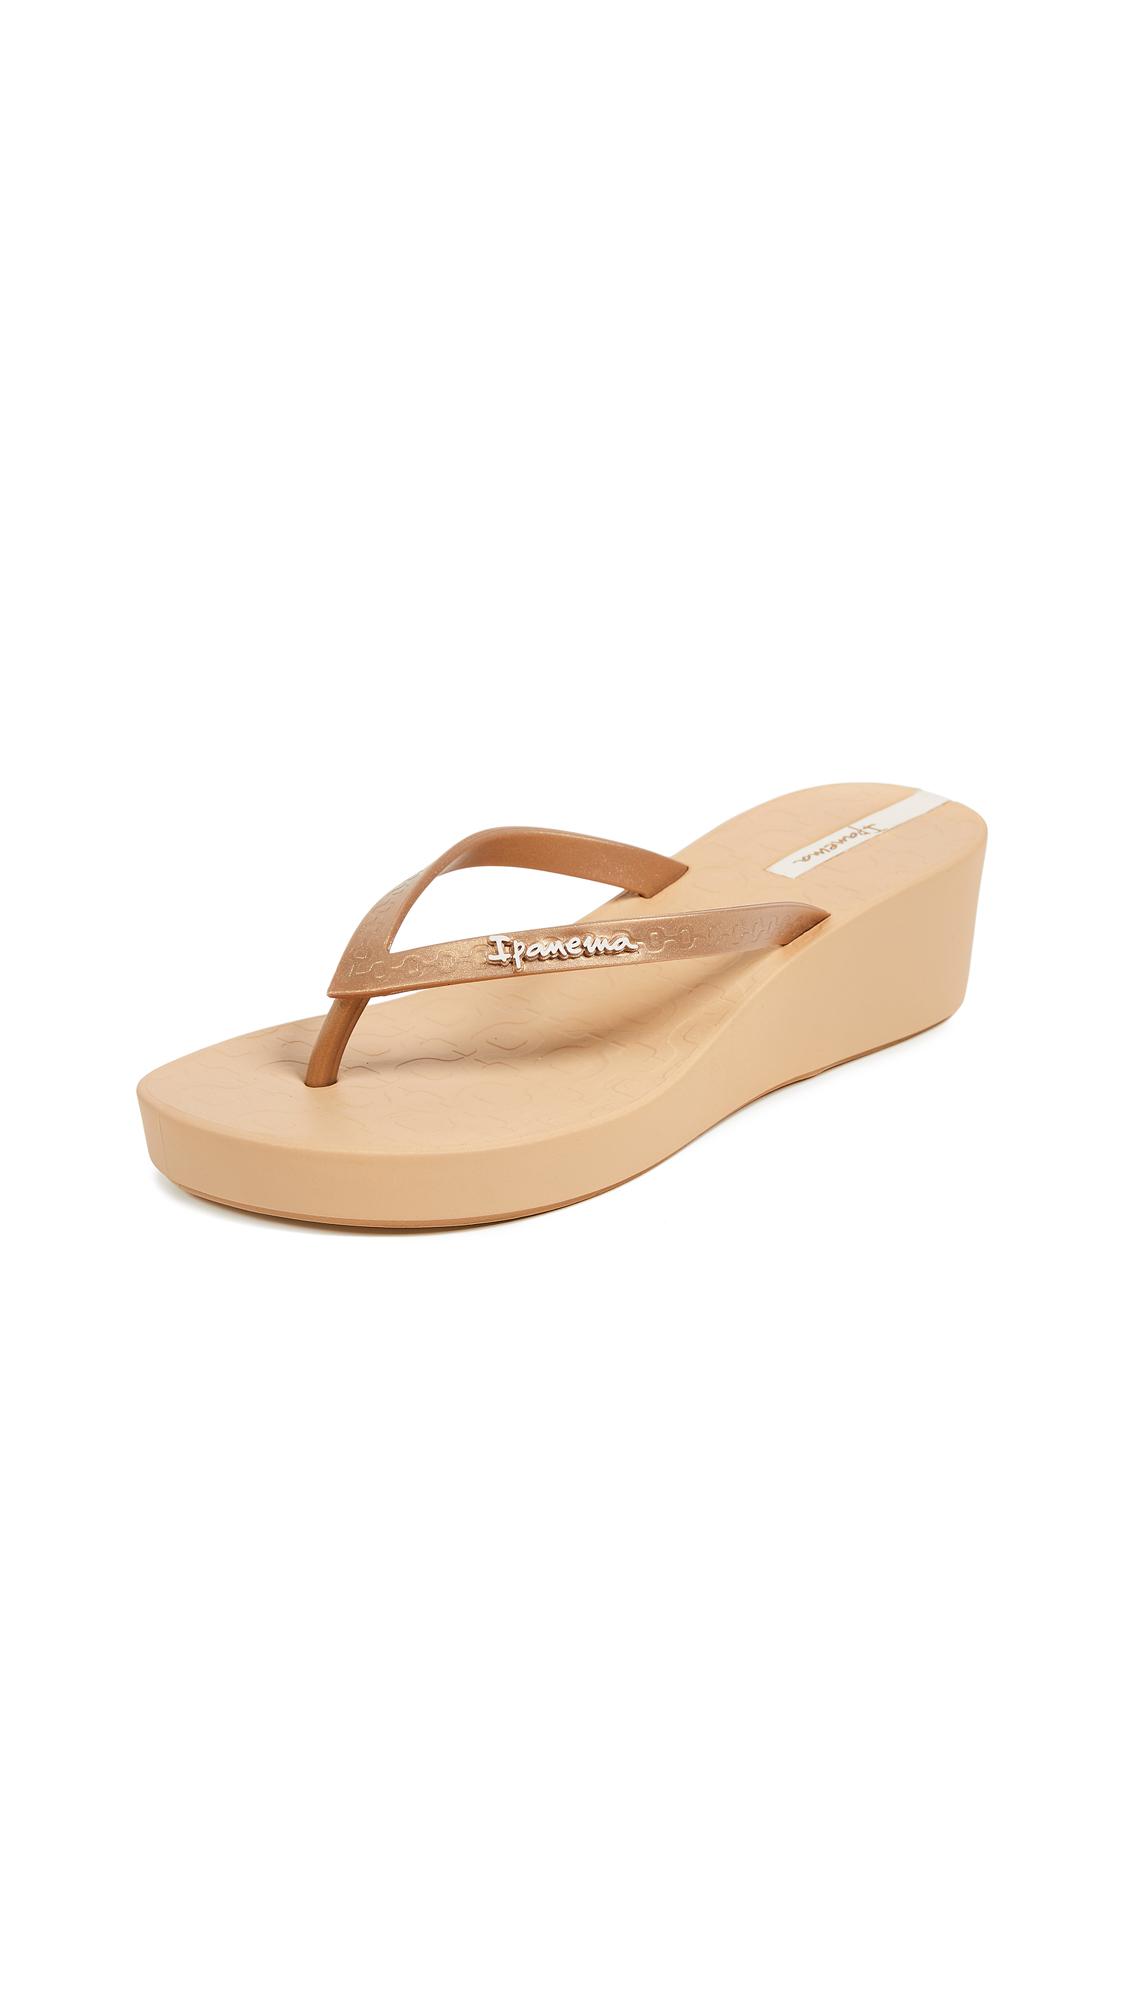 Ipanema Daisy Wedge Flip Flops - Beige/Gold